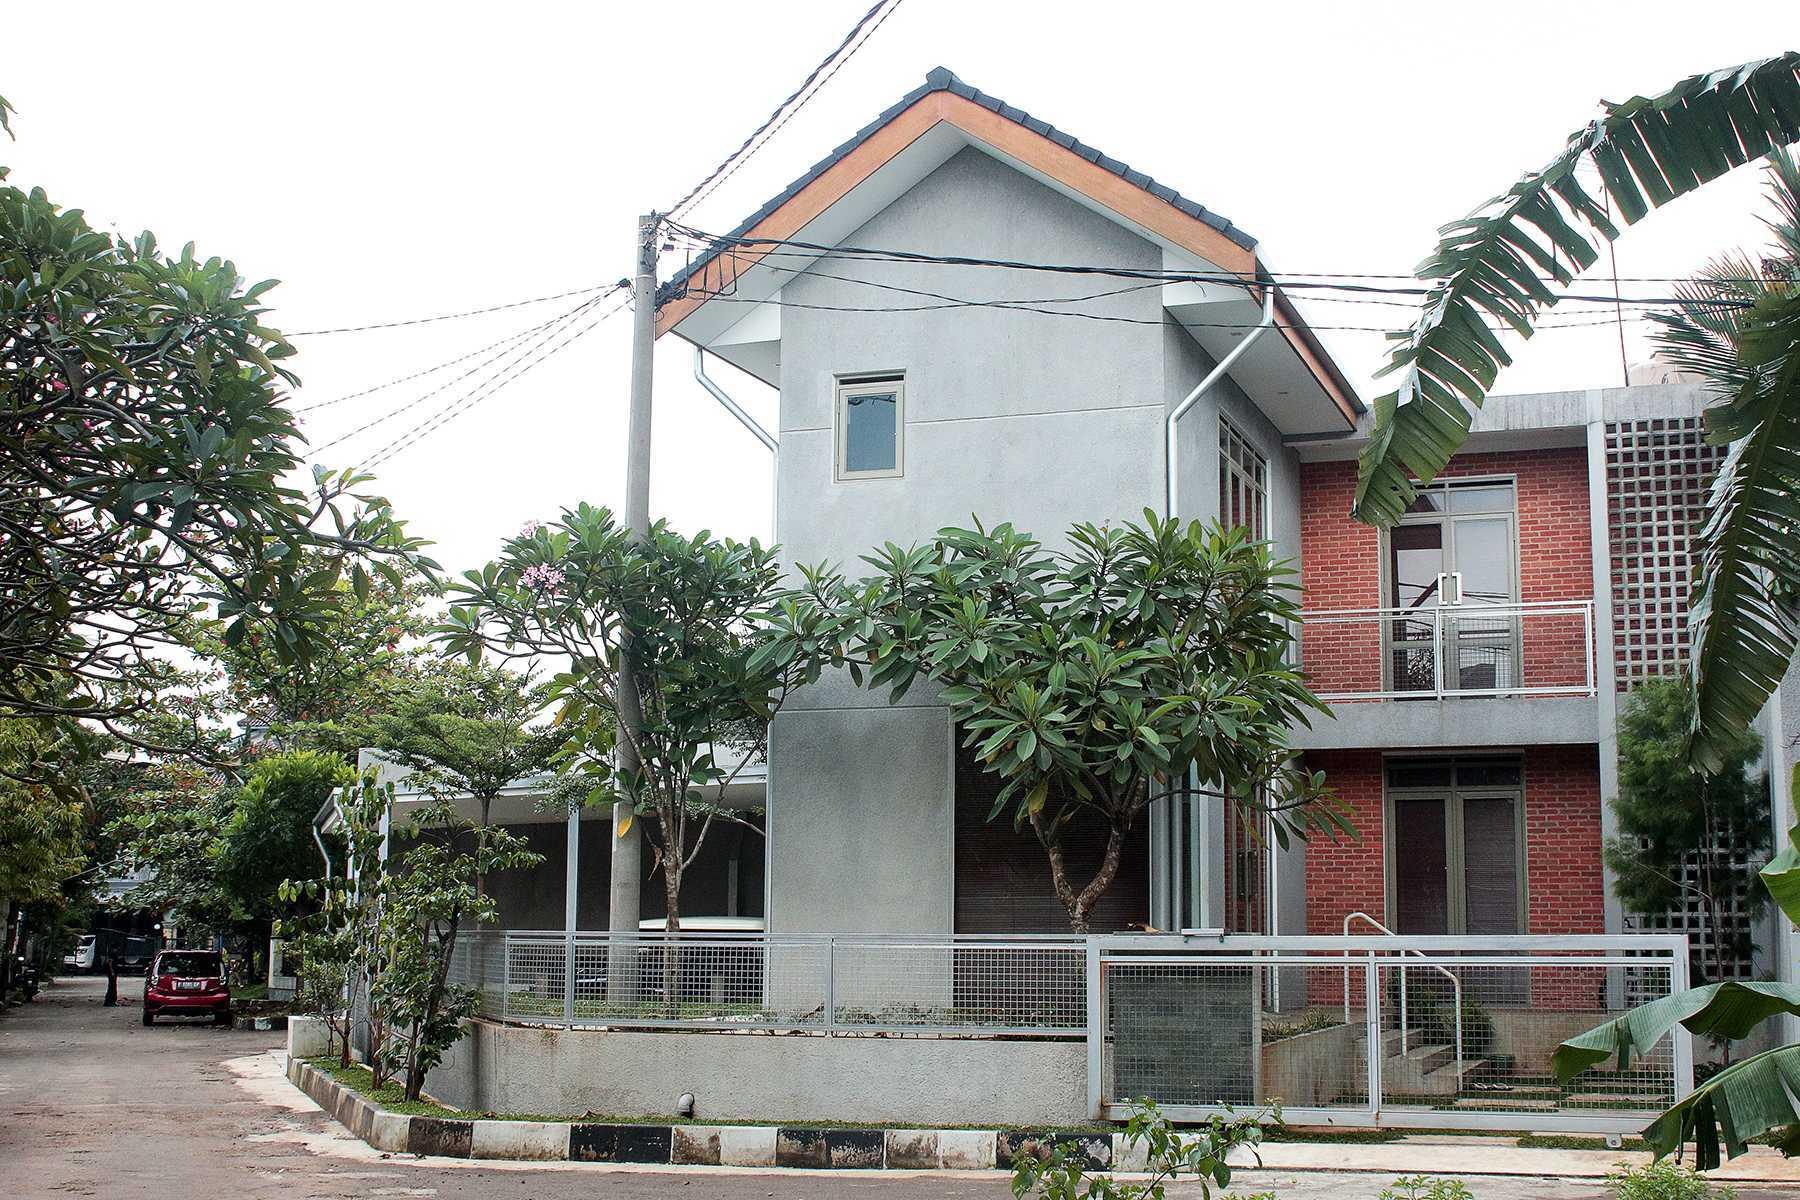 Lukie Widya - Luwist Spatial E+D House Bogor, West Java, Indonesia Bogor, West Java, Indonesia Img9311E   31132